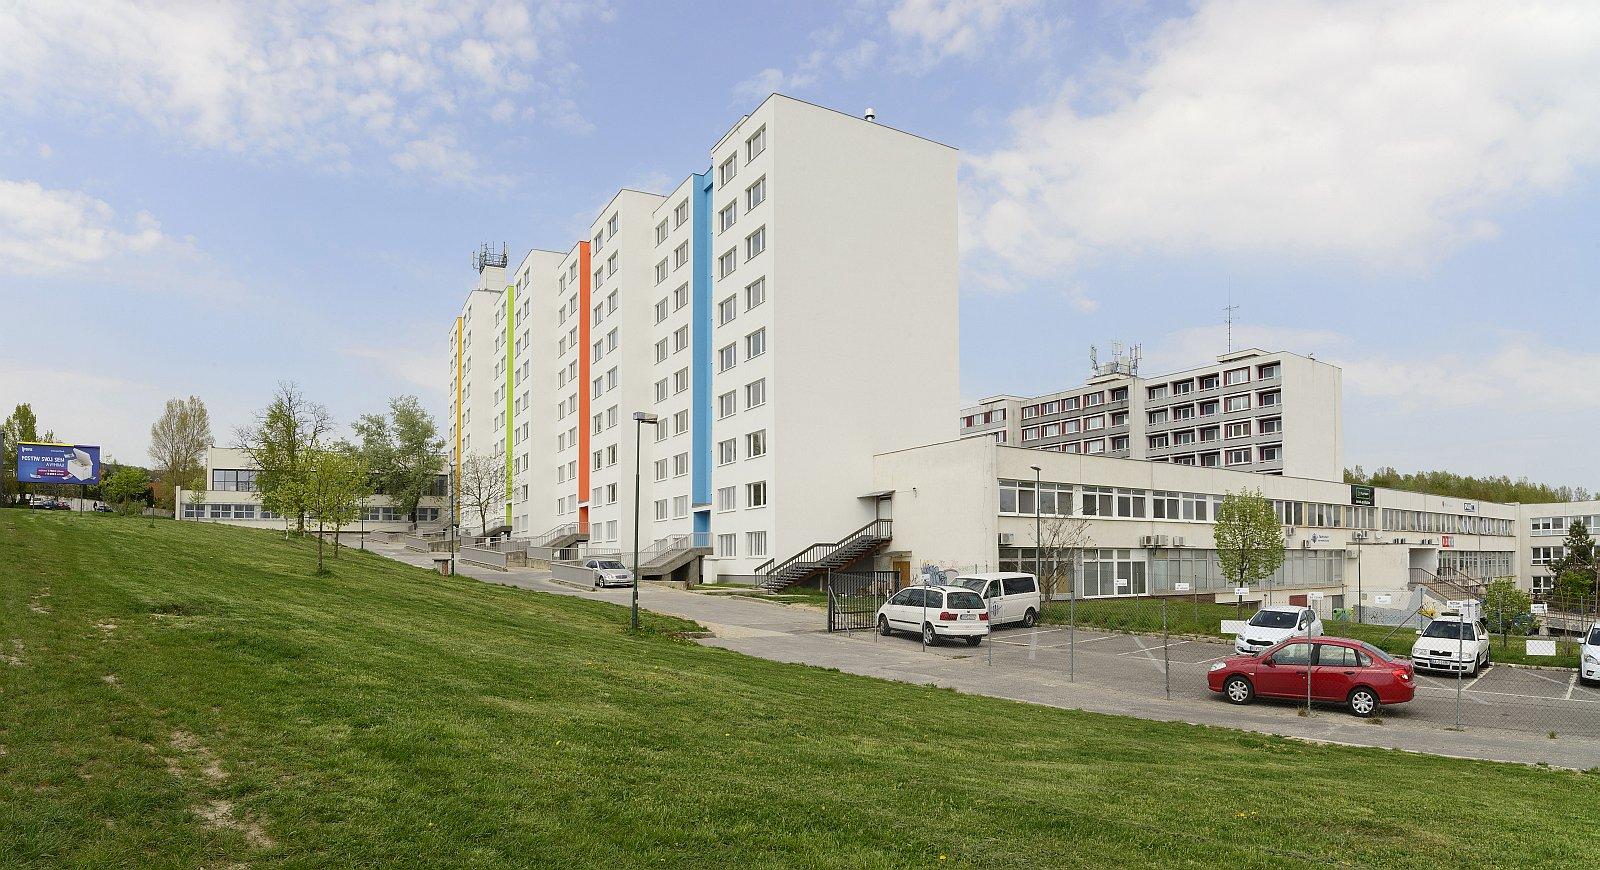 Vysokoškolské mesto Ľ. Štúra Mlyny UK – Staré grunty Bratislava